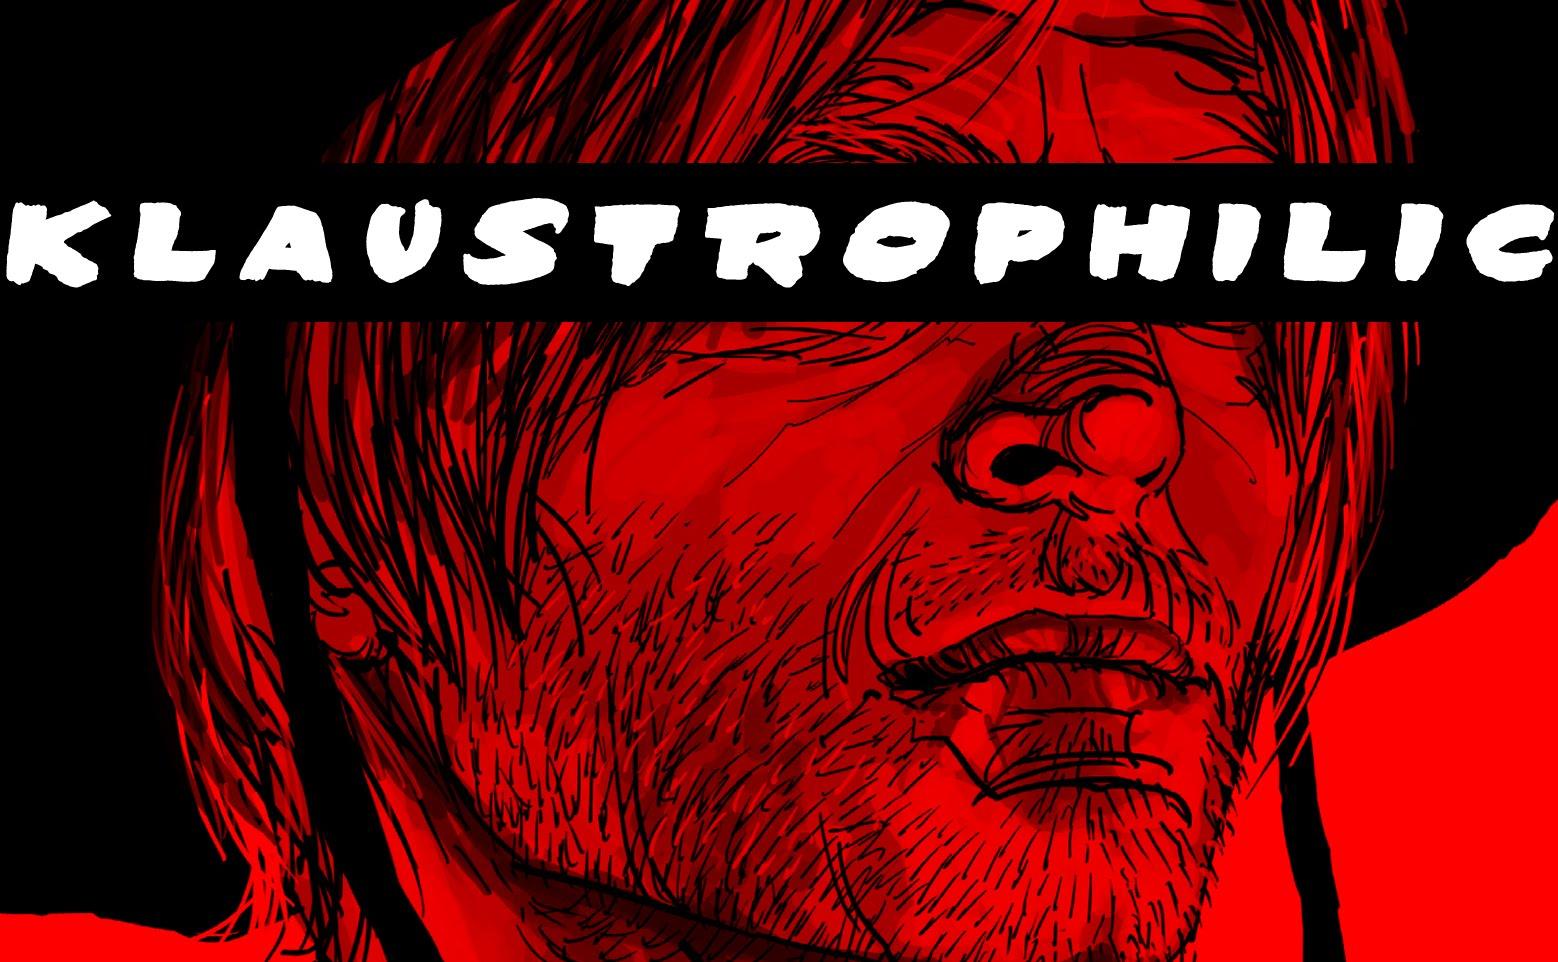 Klaustrophilic